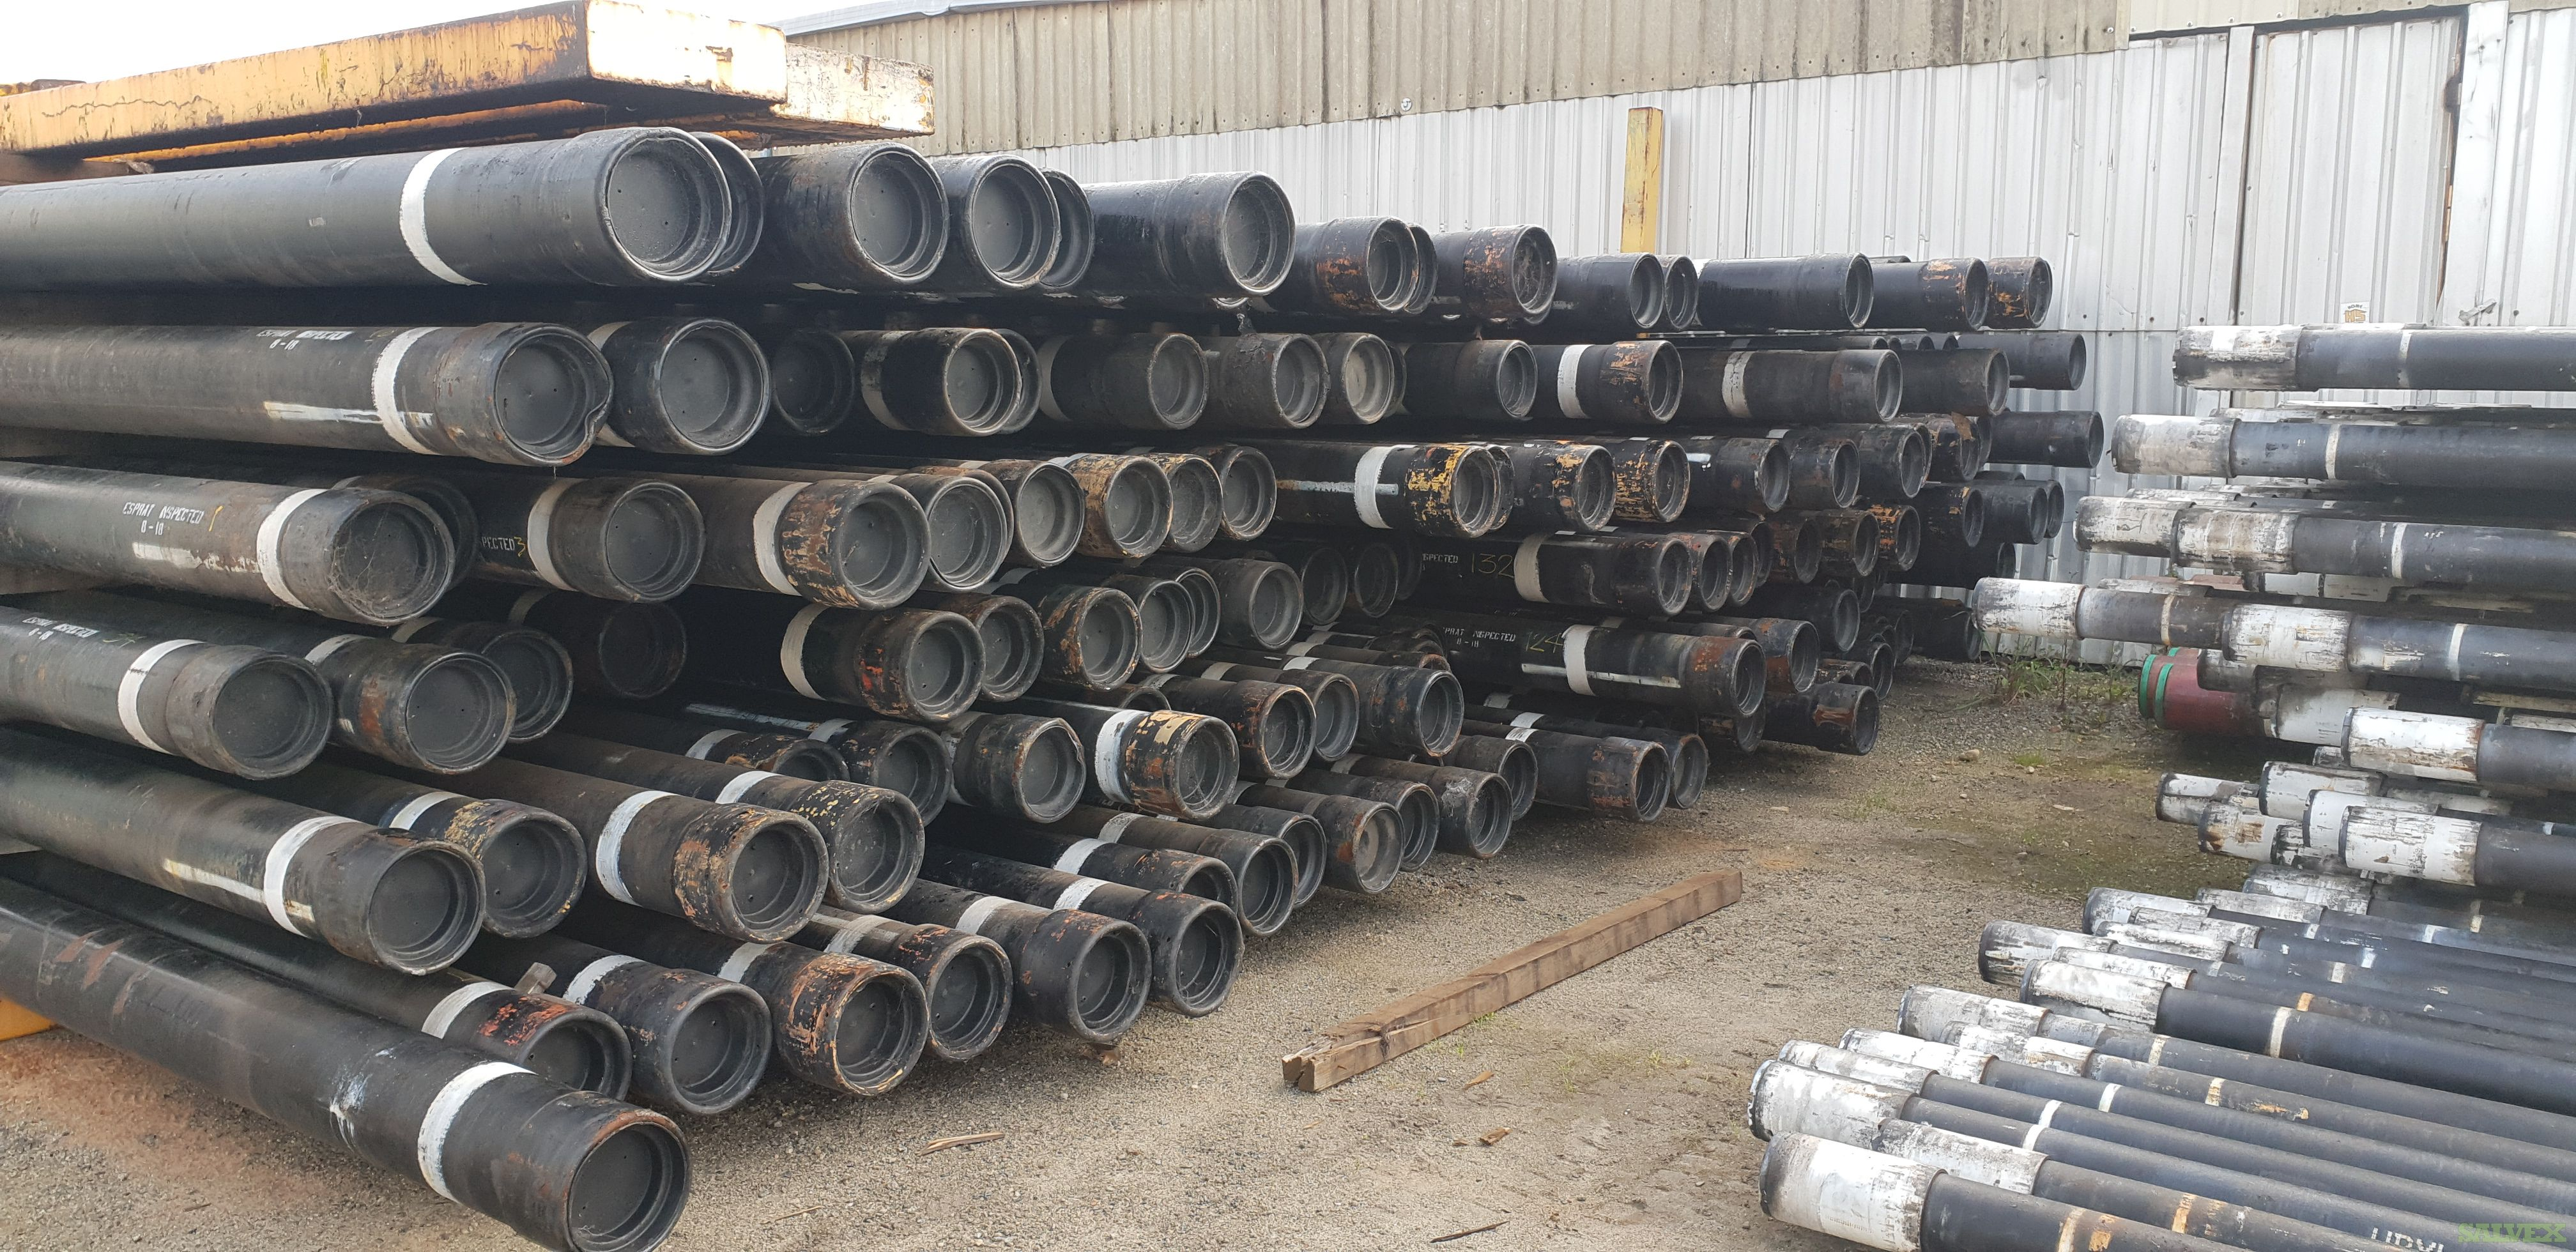 9 5/8 47# L80 BTC R3 Surplus Casing (7,251 Feet / 155 Metric Tons)